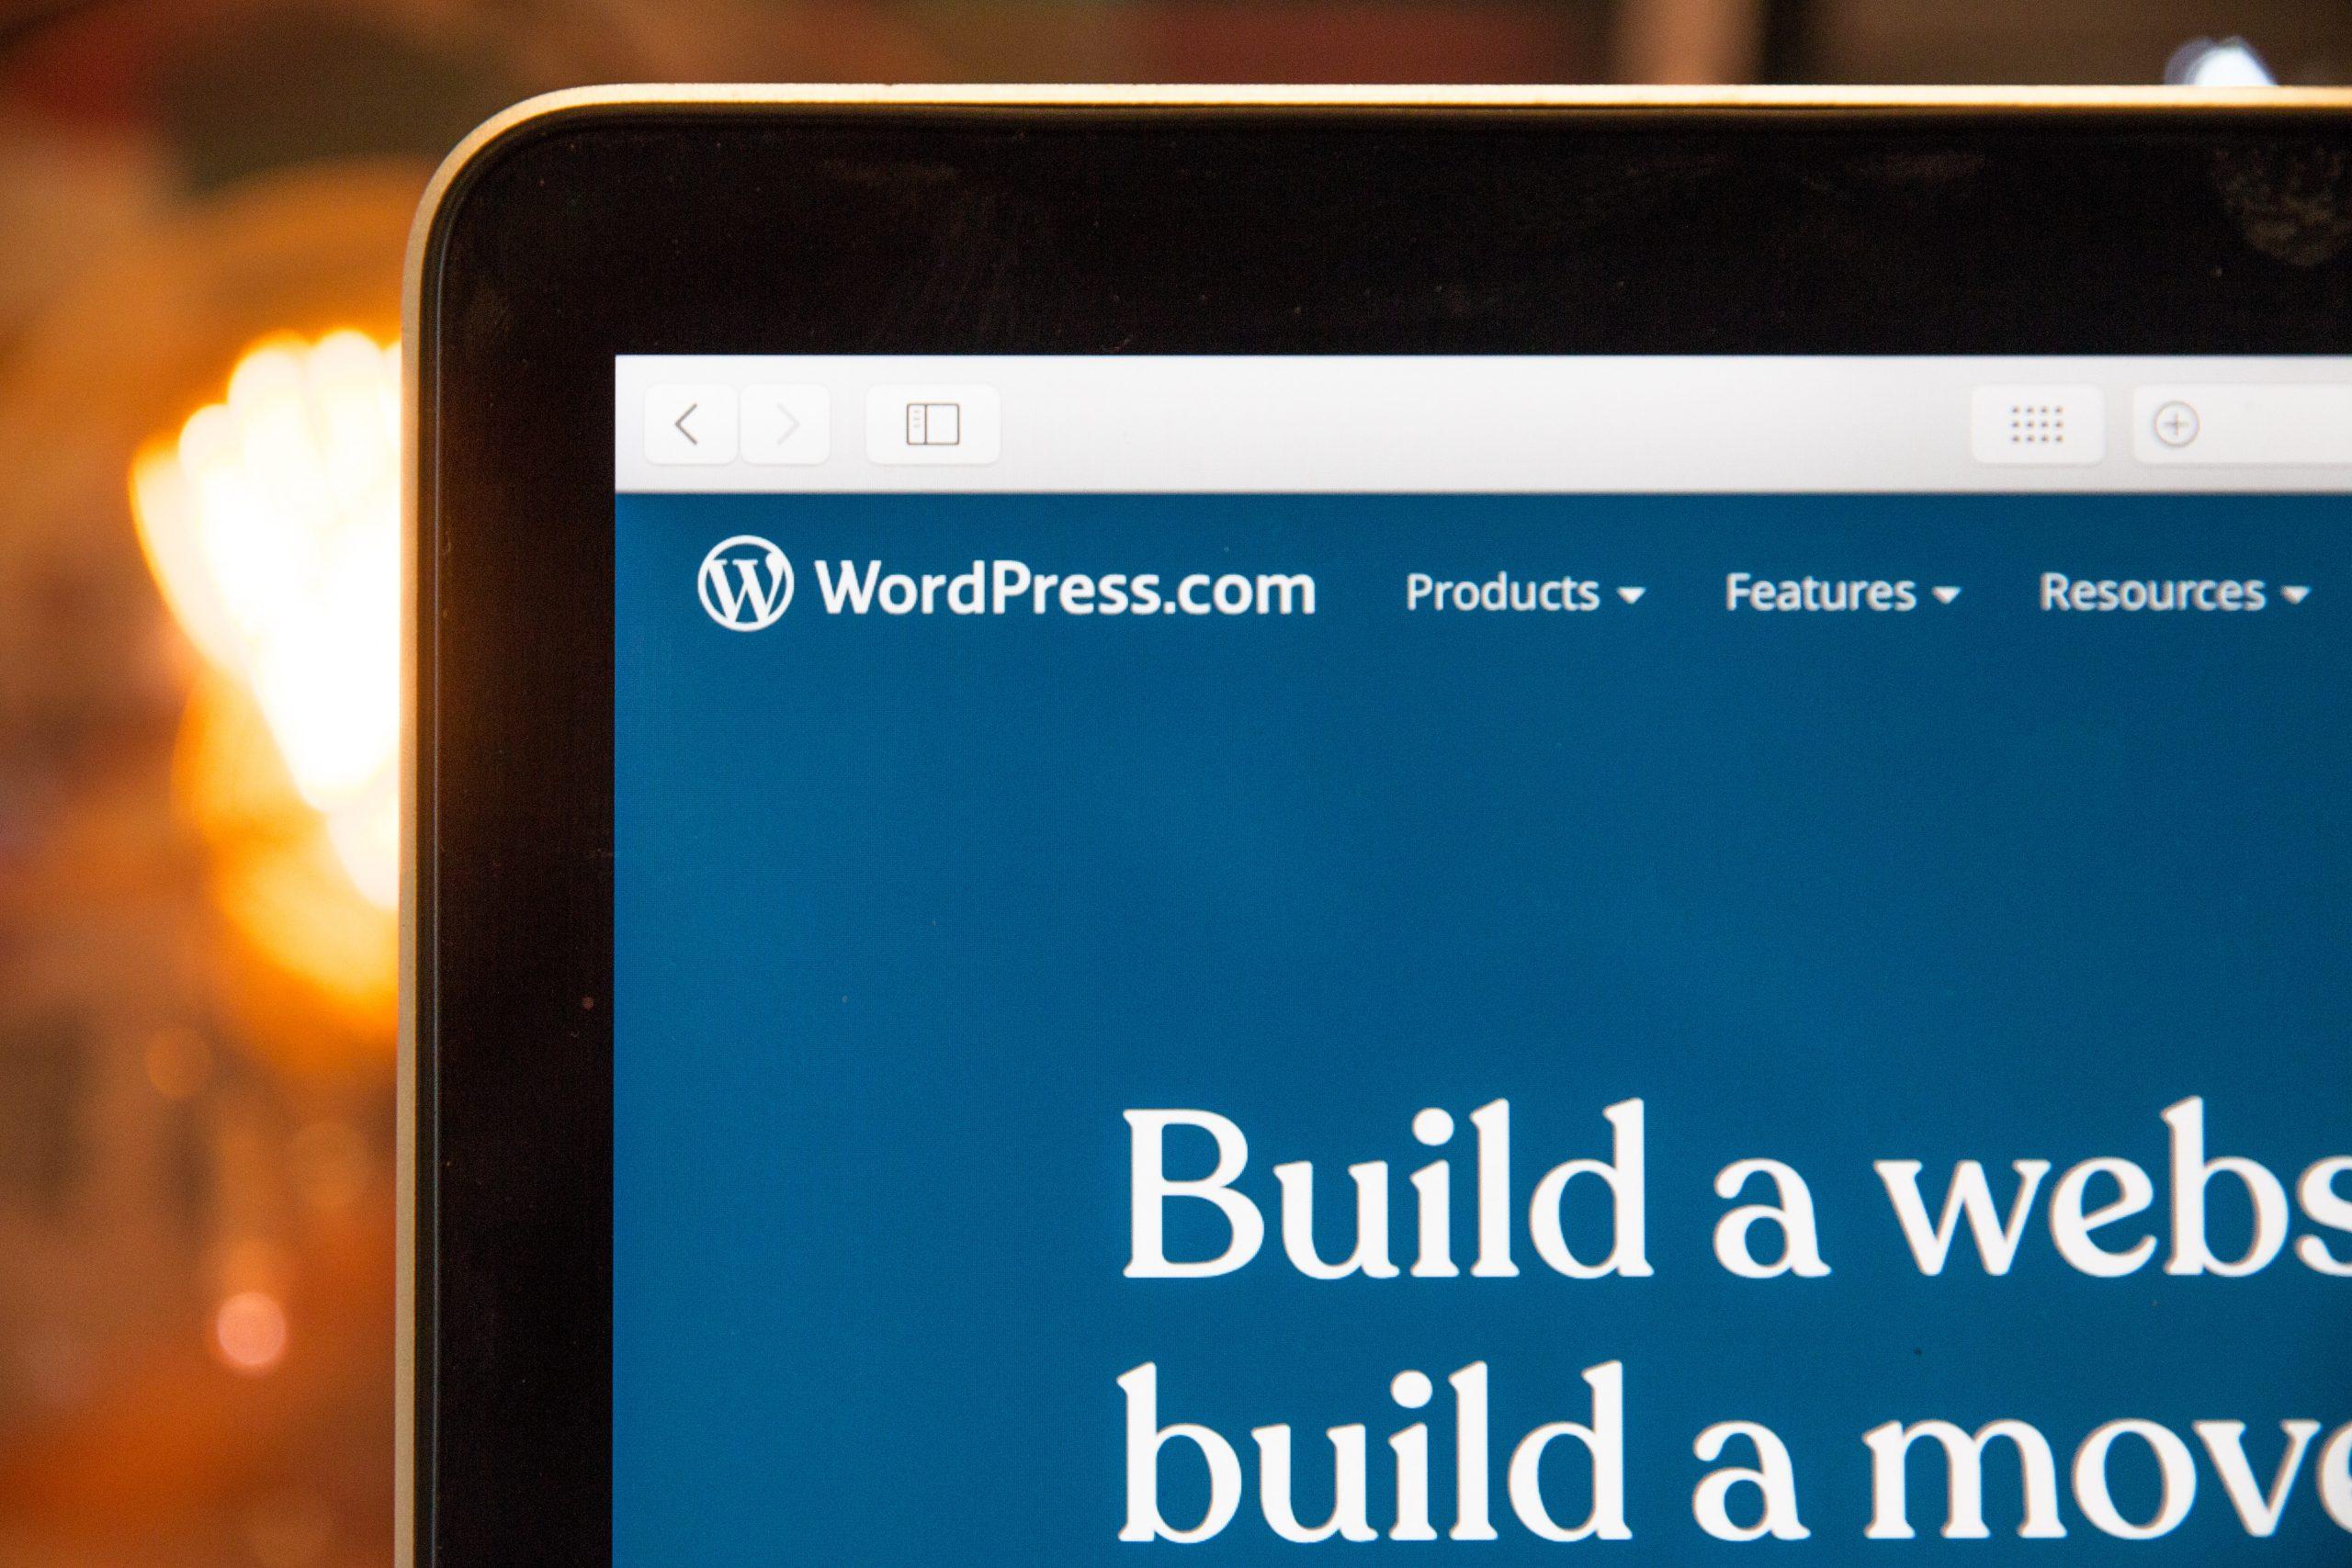 Formation Wordpress organisme de formation Pyramidia